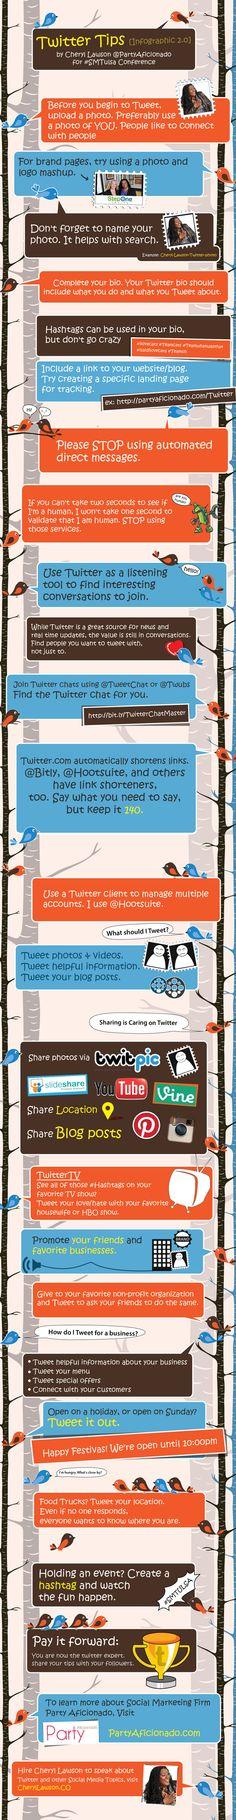 Hoe begin je met #Twitter? 'Twitter tips' #infographic by Cheryl Lawson